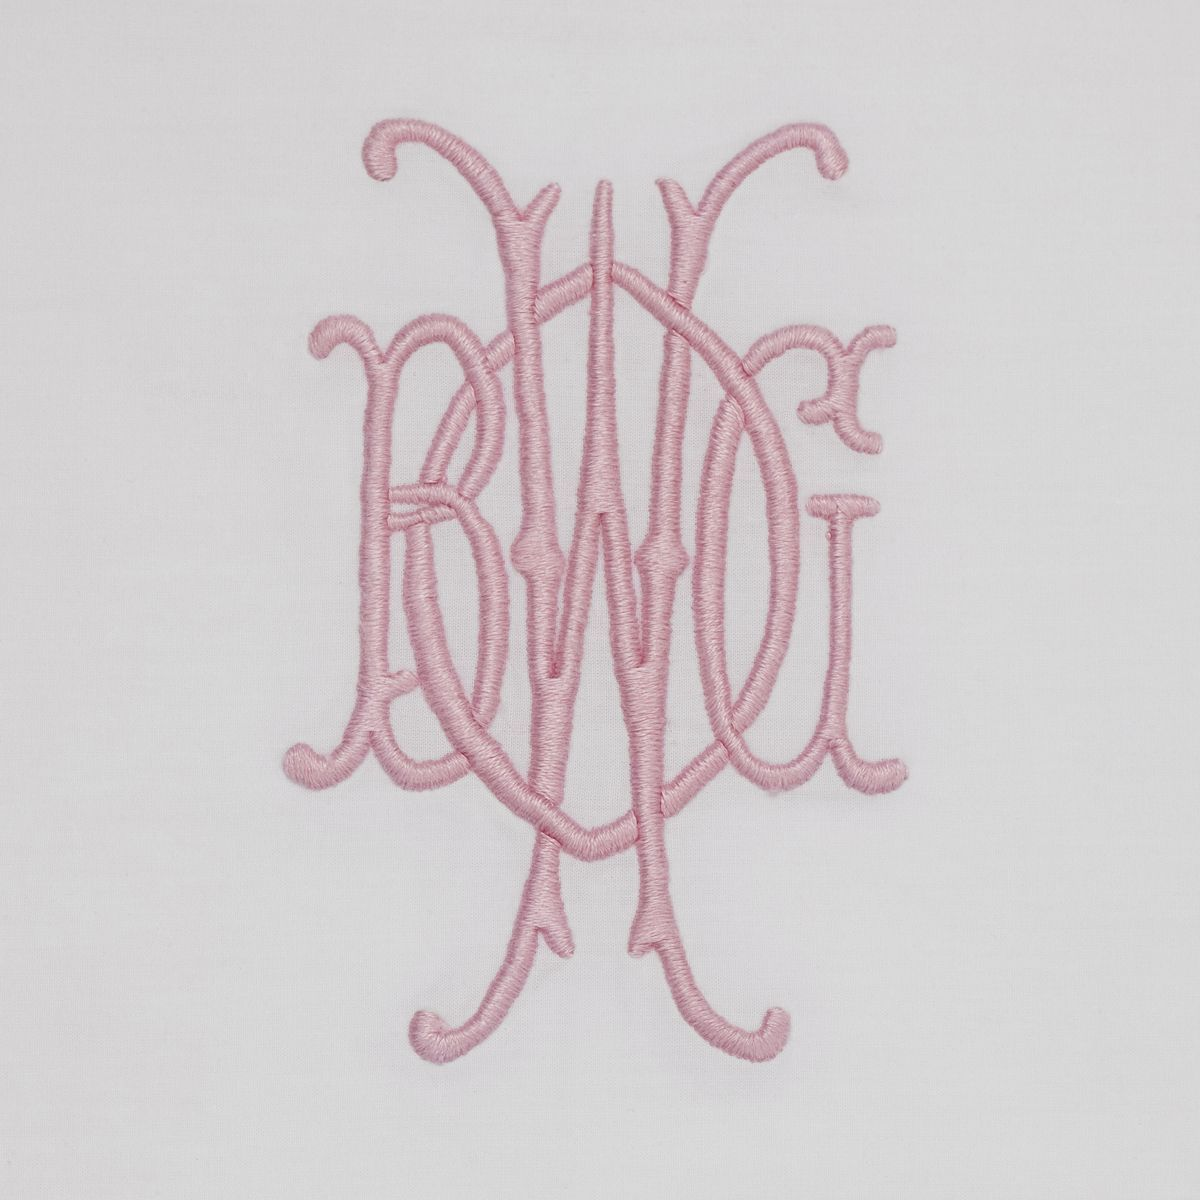 Overlap Embroidery monogram, Embroidery monogram fonts